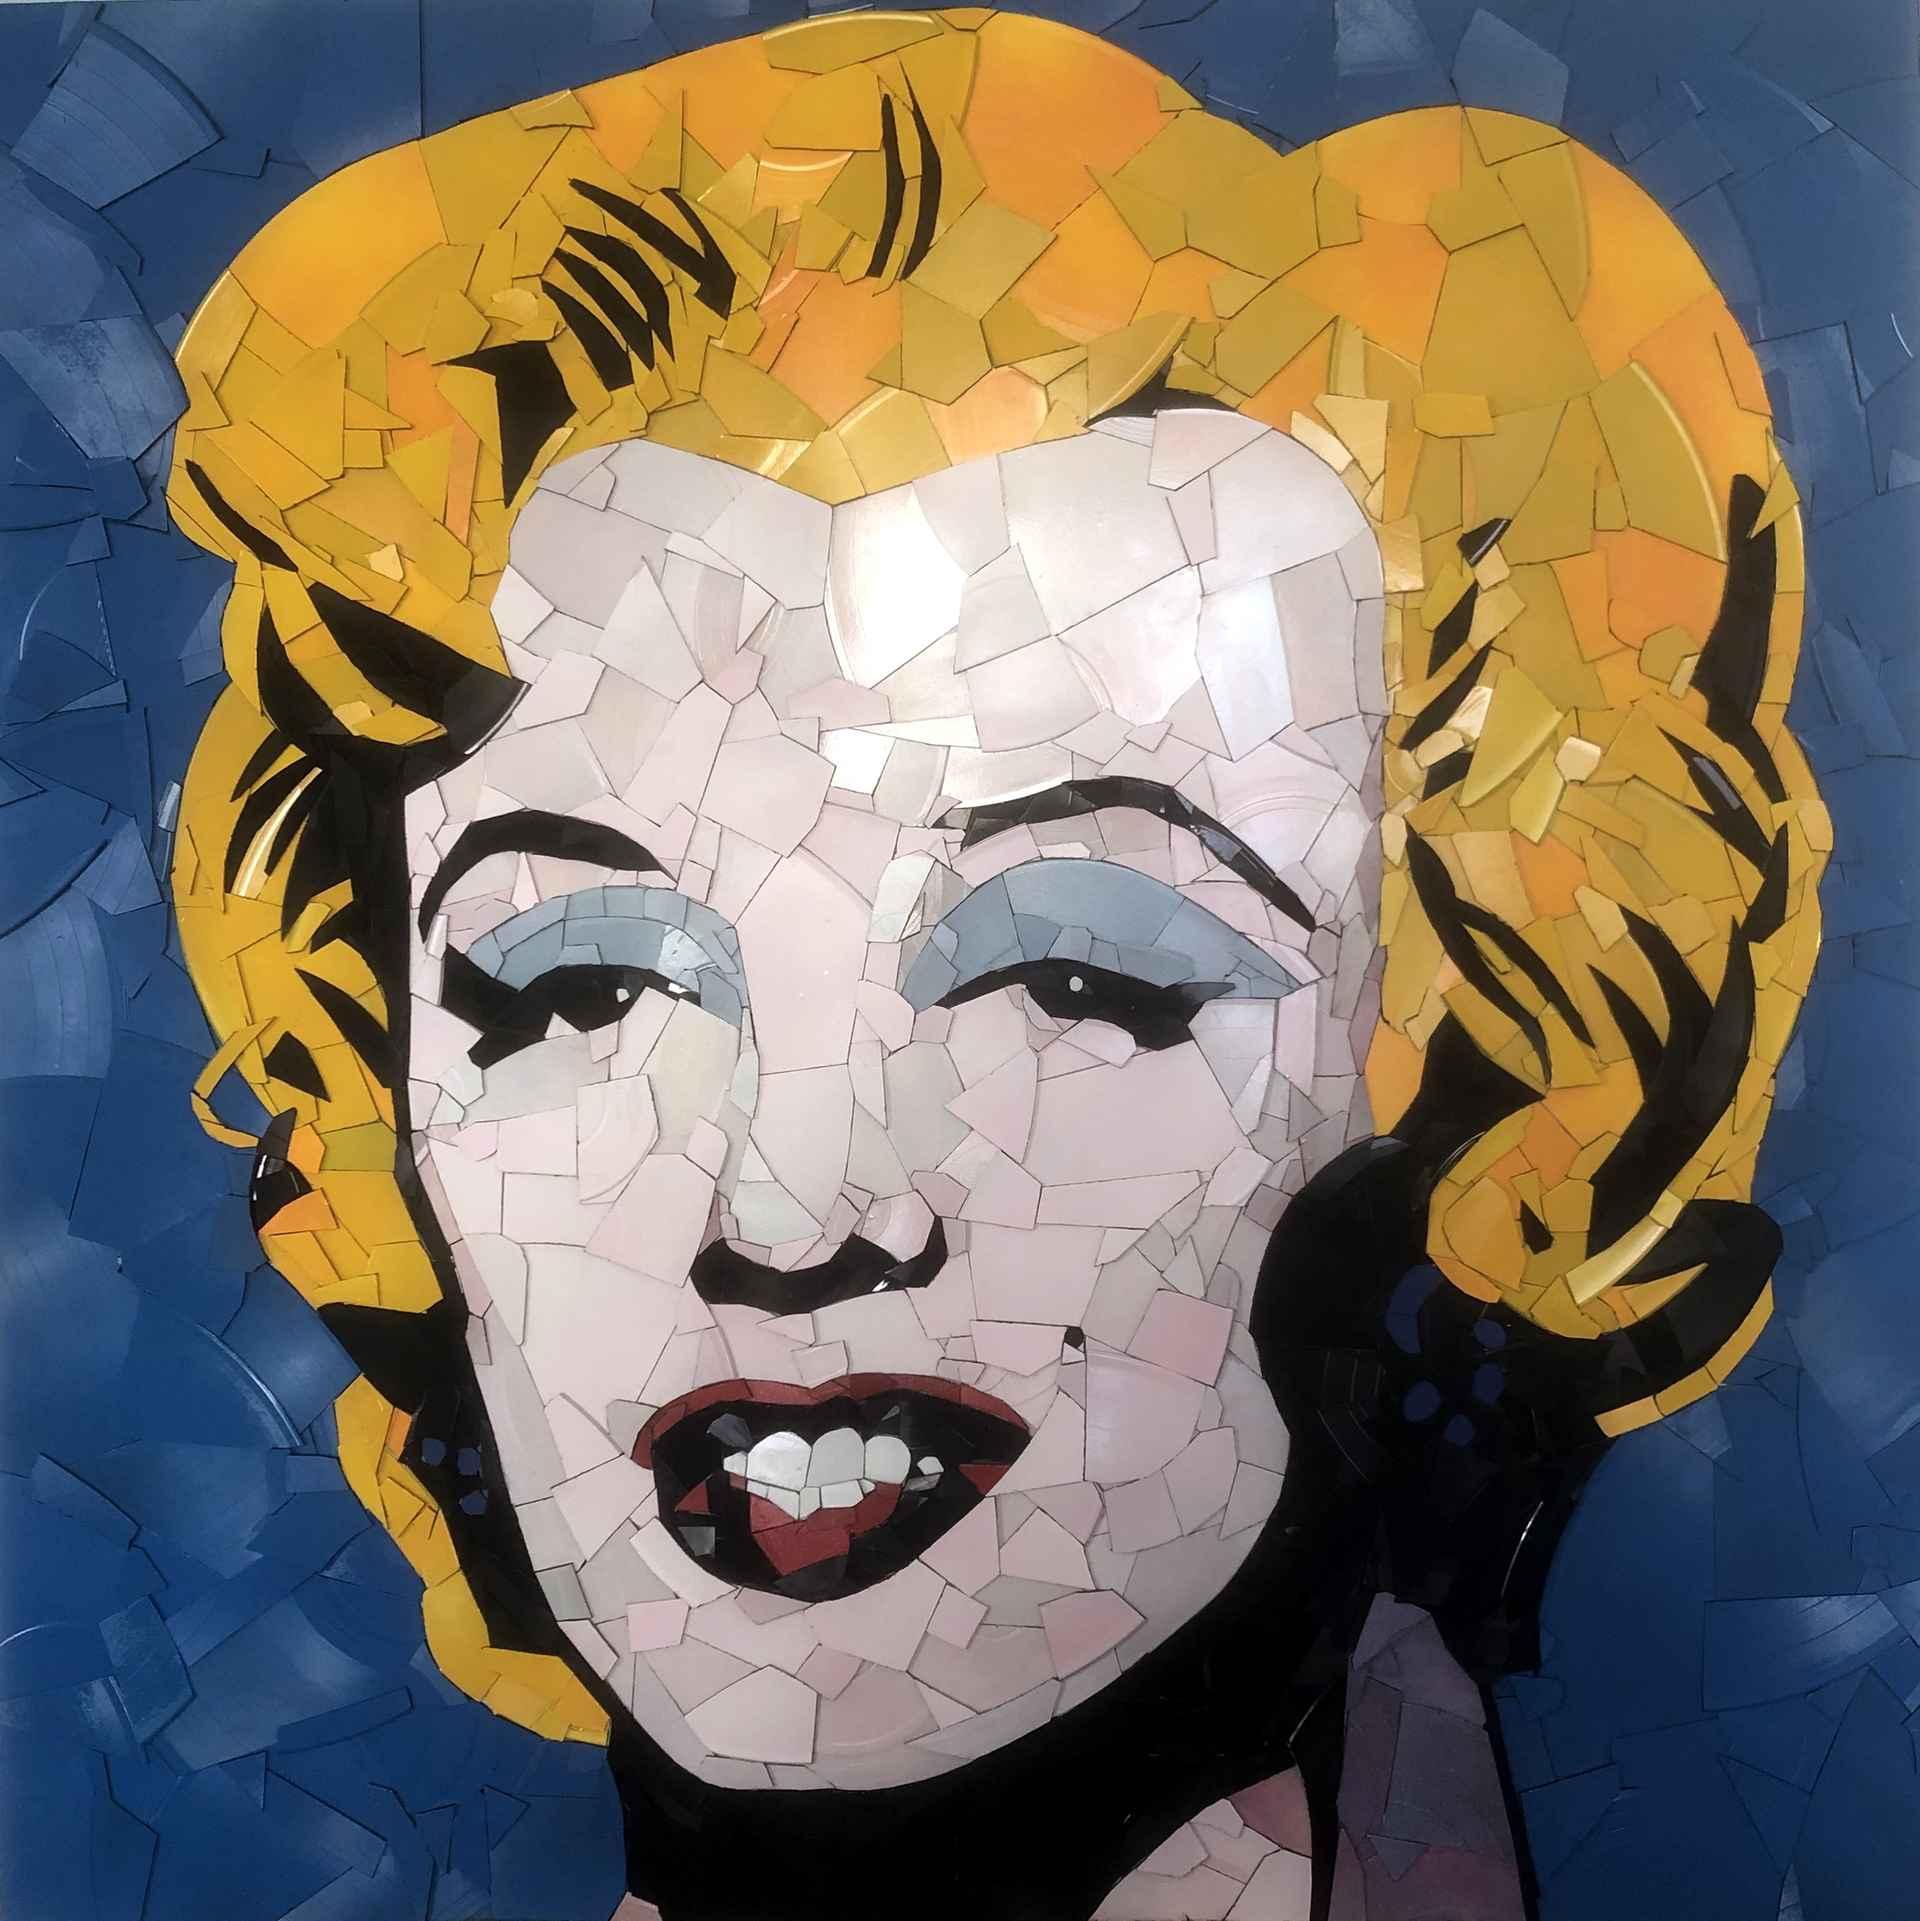 Marilyn vs Warhol by Ed Chapman